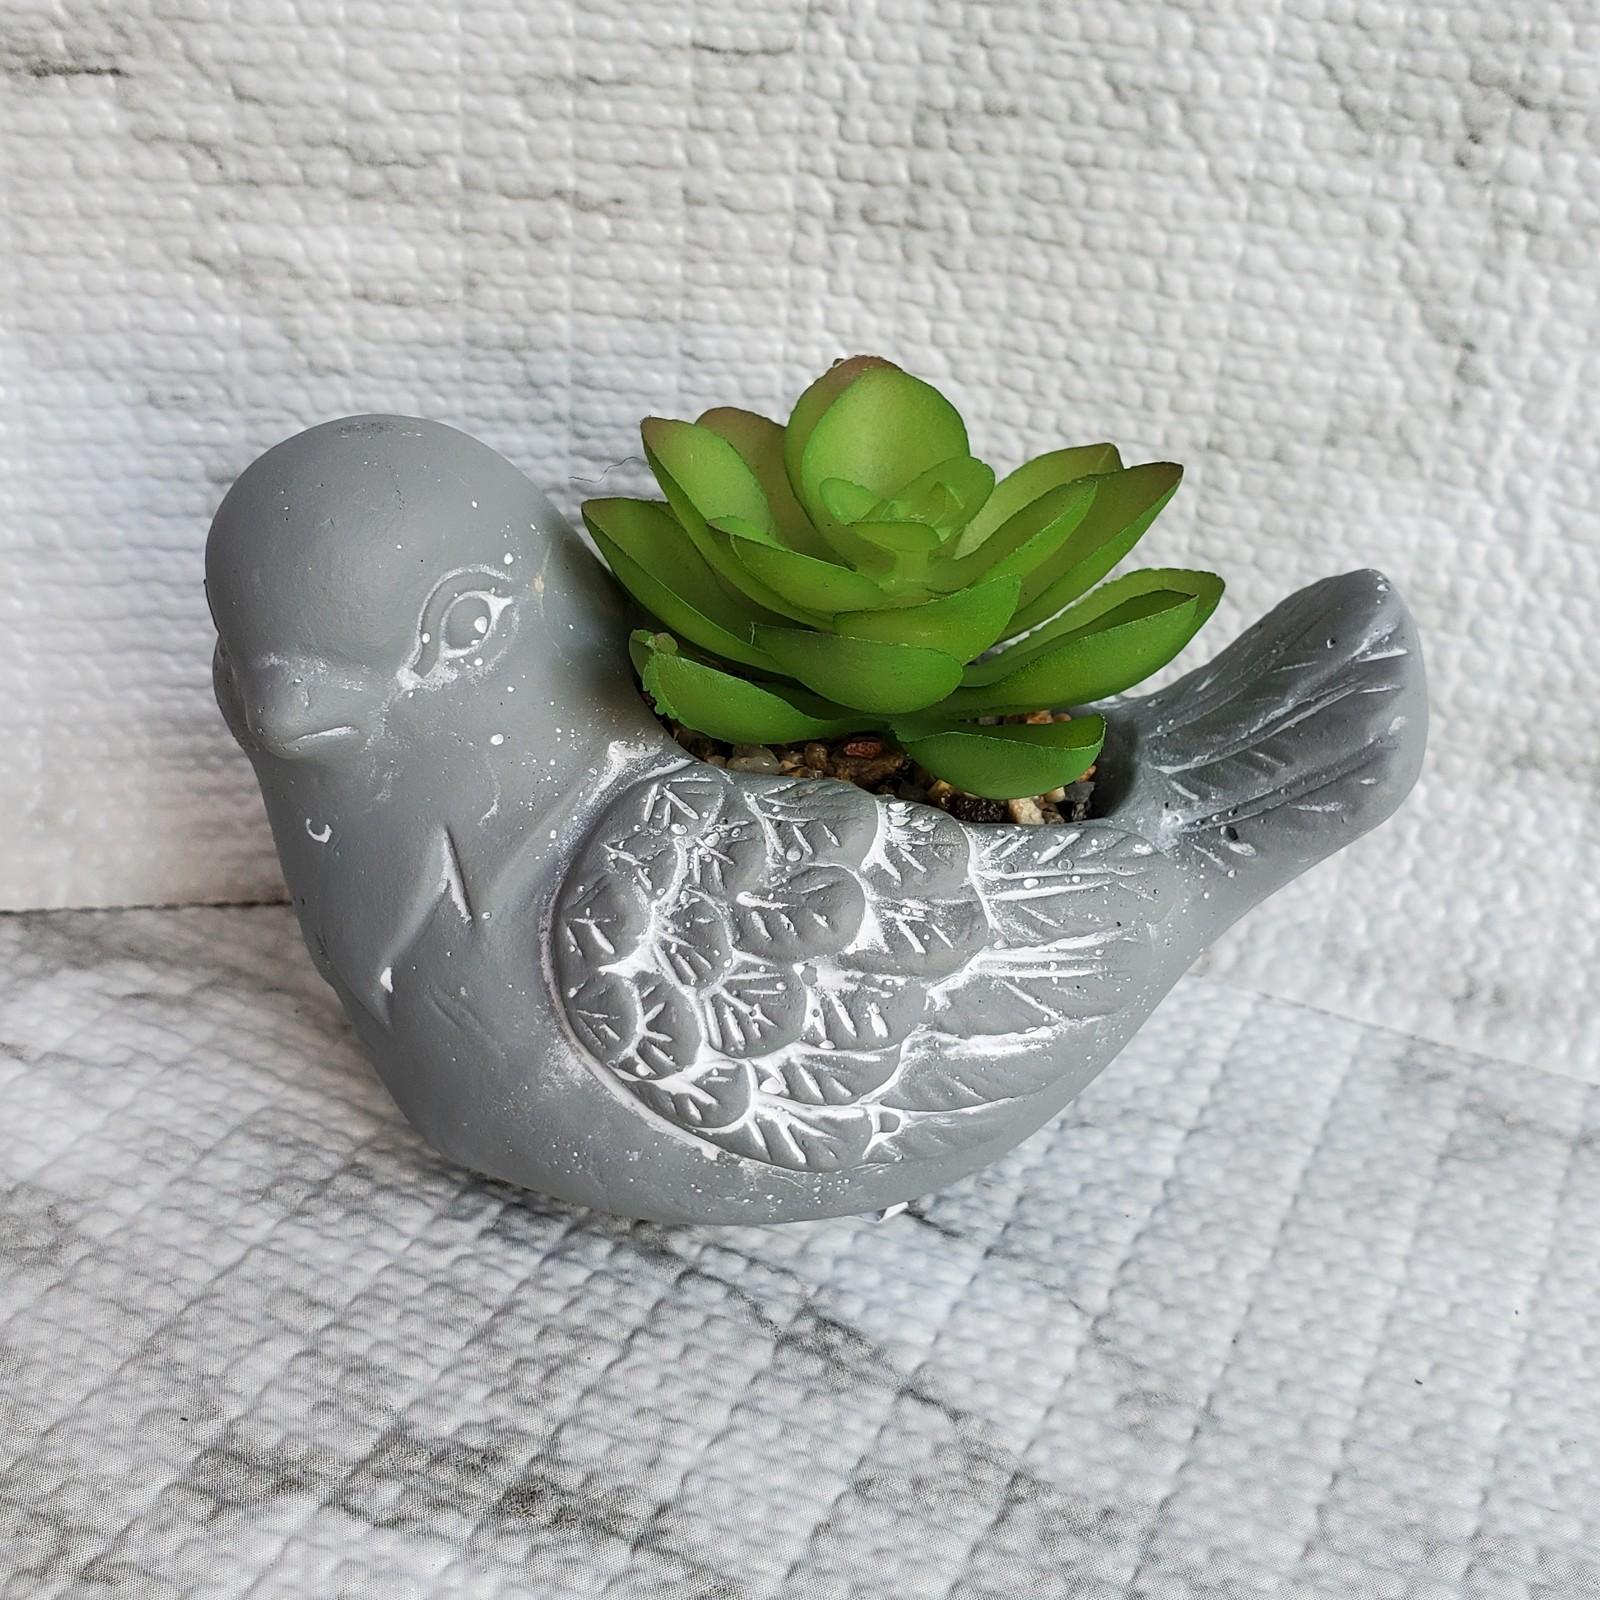 Concretebird fauxsucculent 1